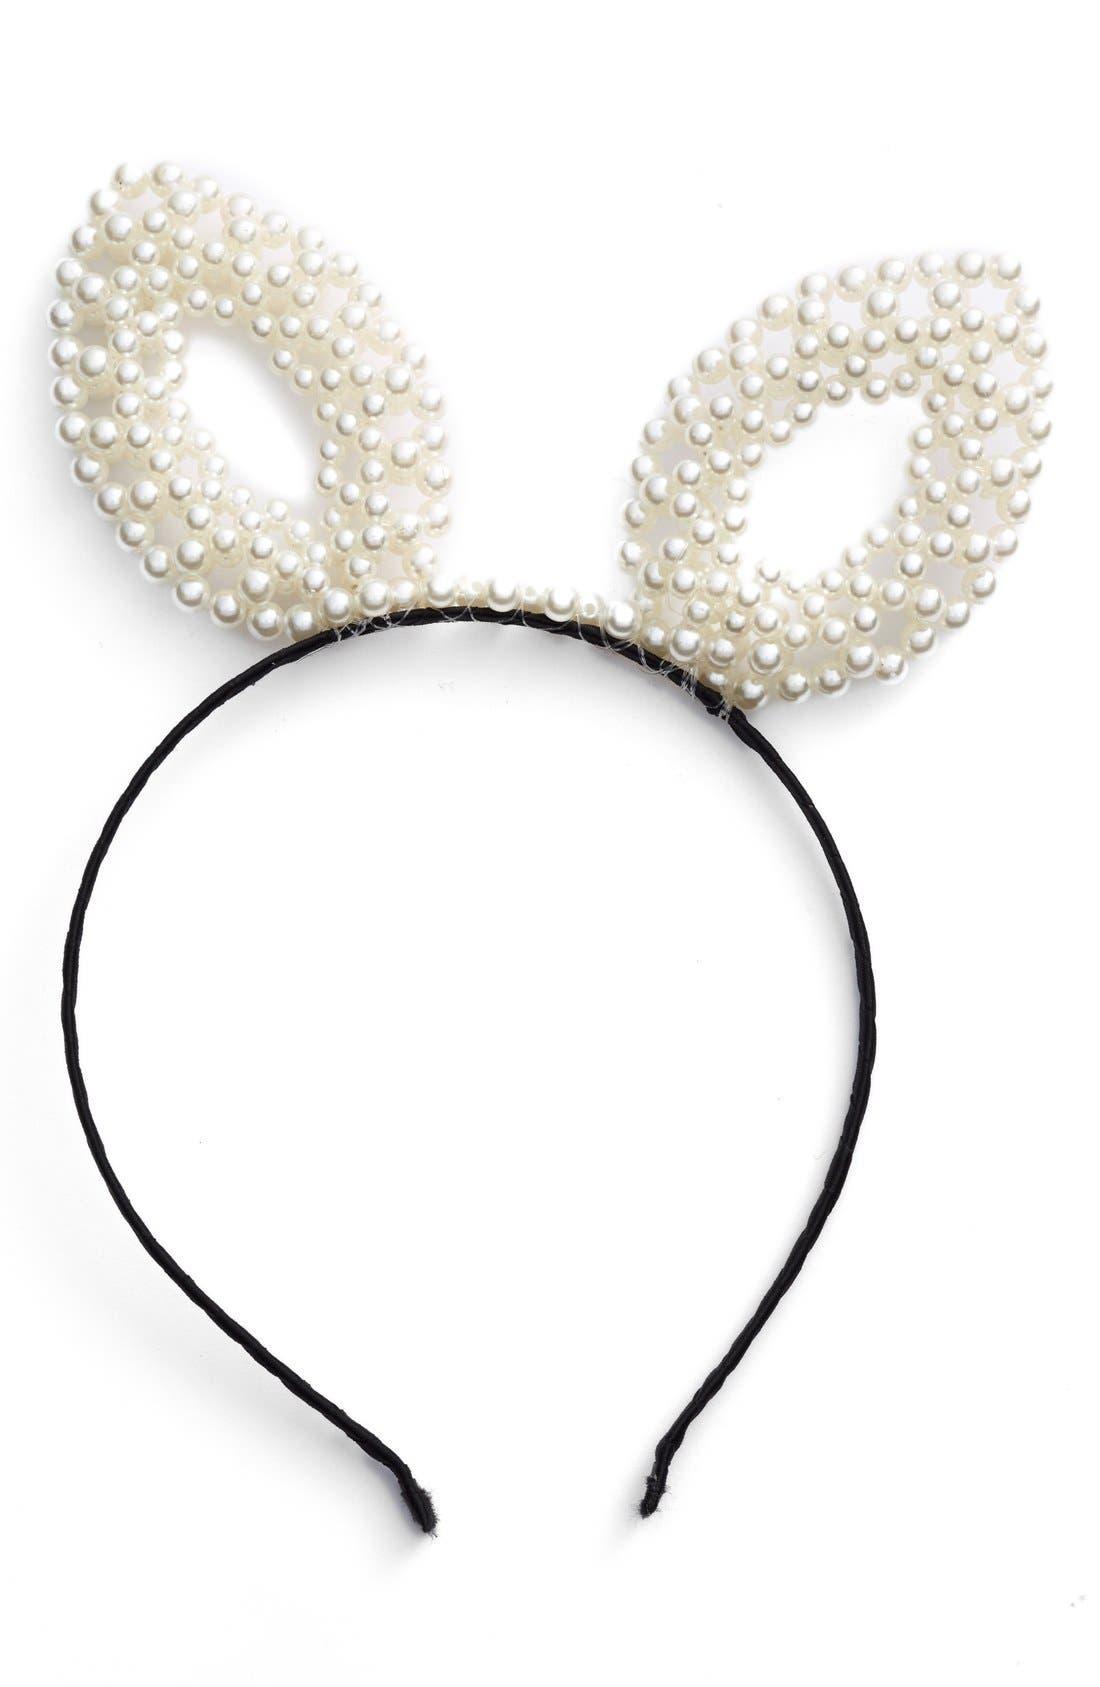 Alternate Image 1 Selected - BP. Pearly Bunny Ear Headband